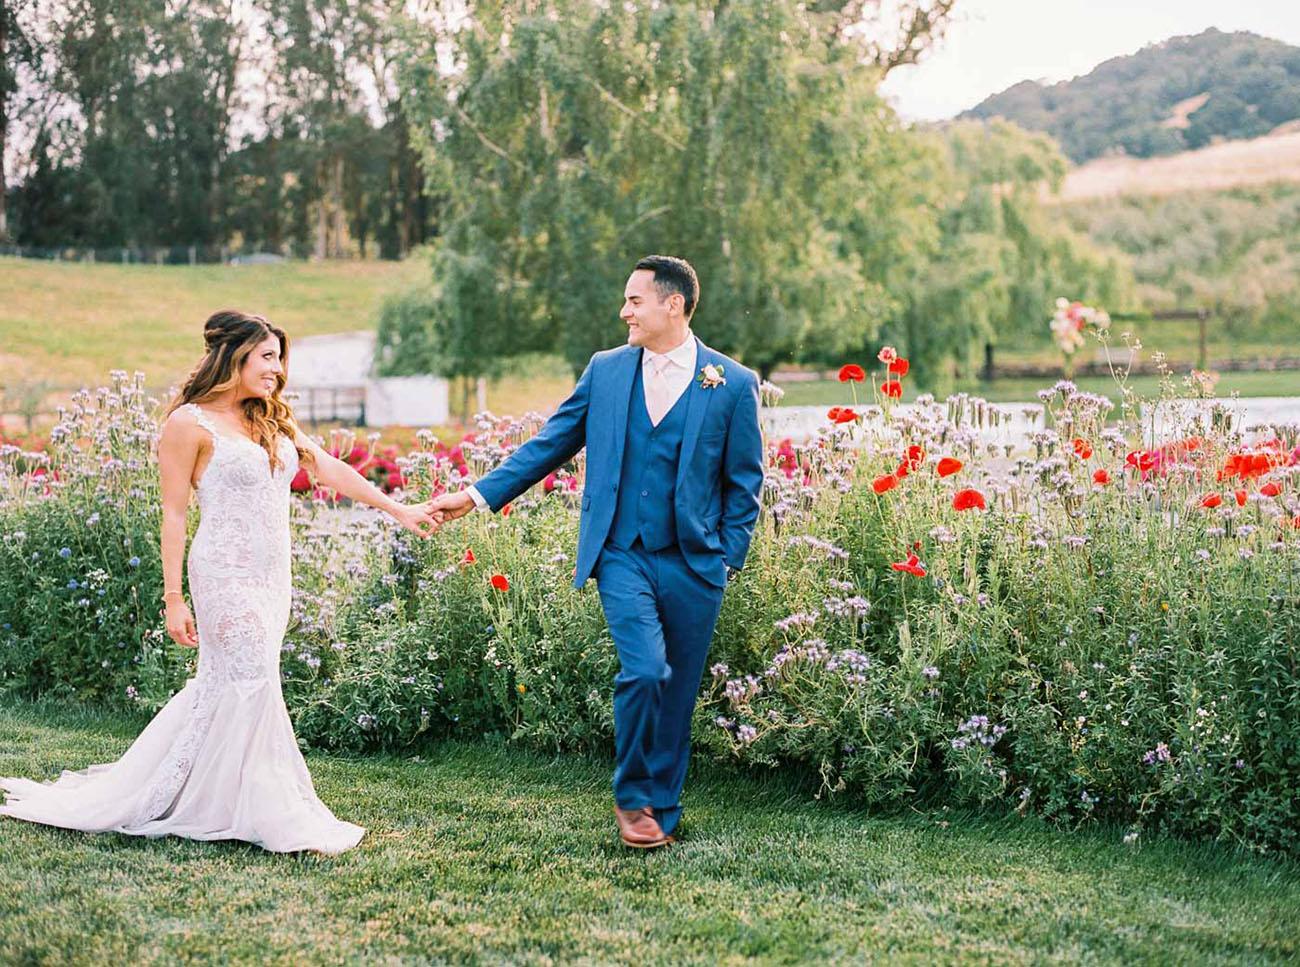 The Farm Festival Weddings amp Events Congleton England